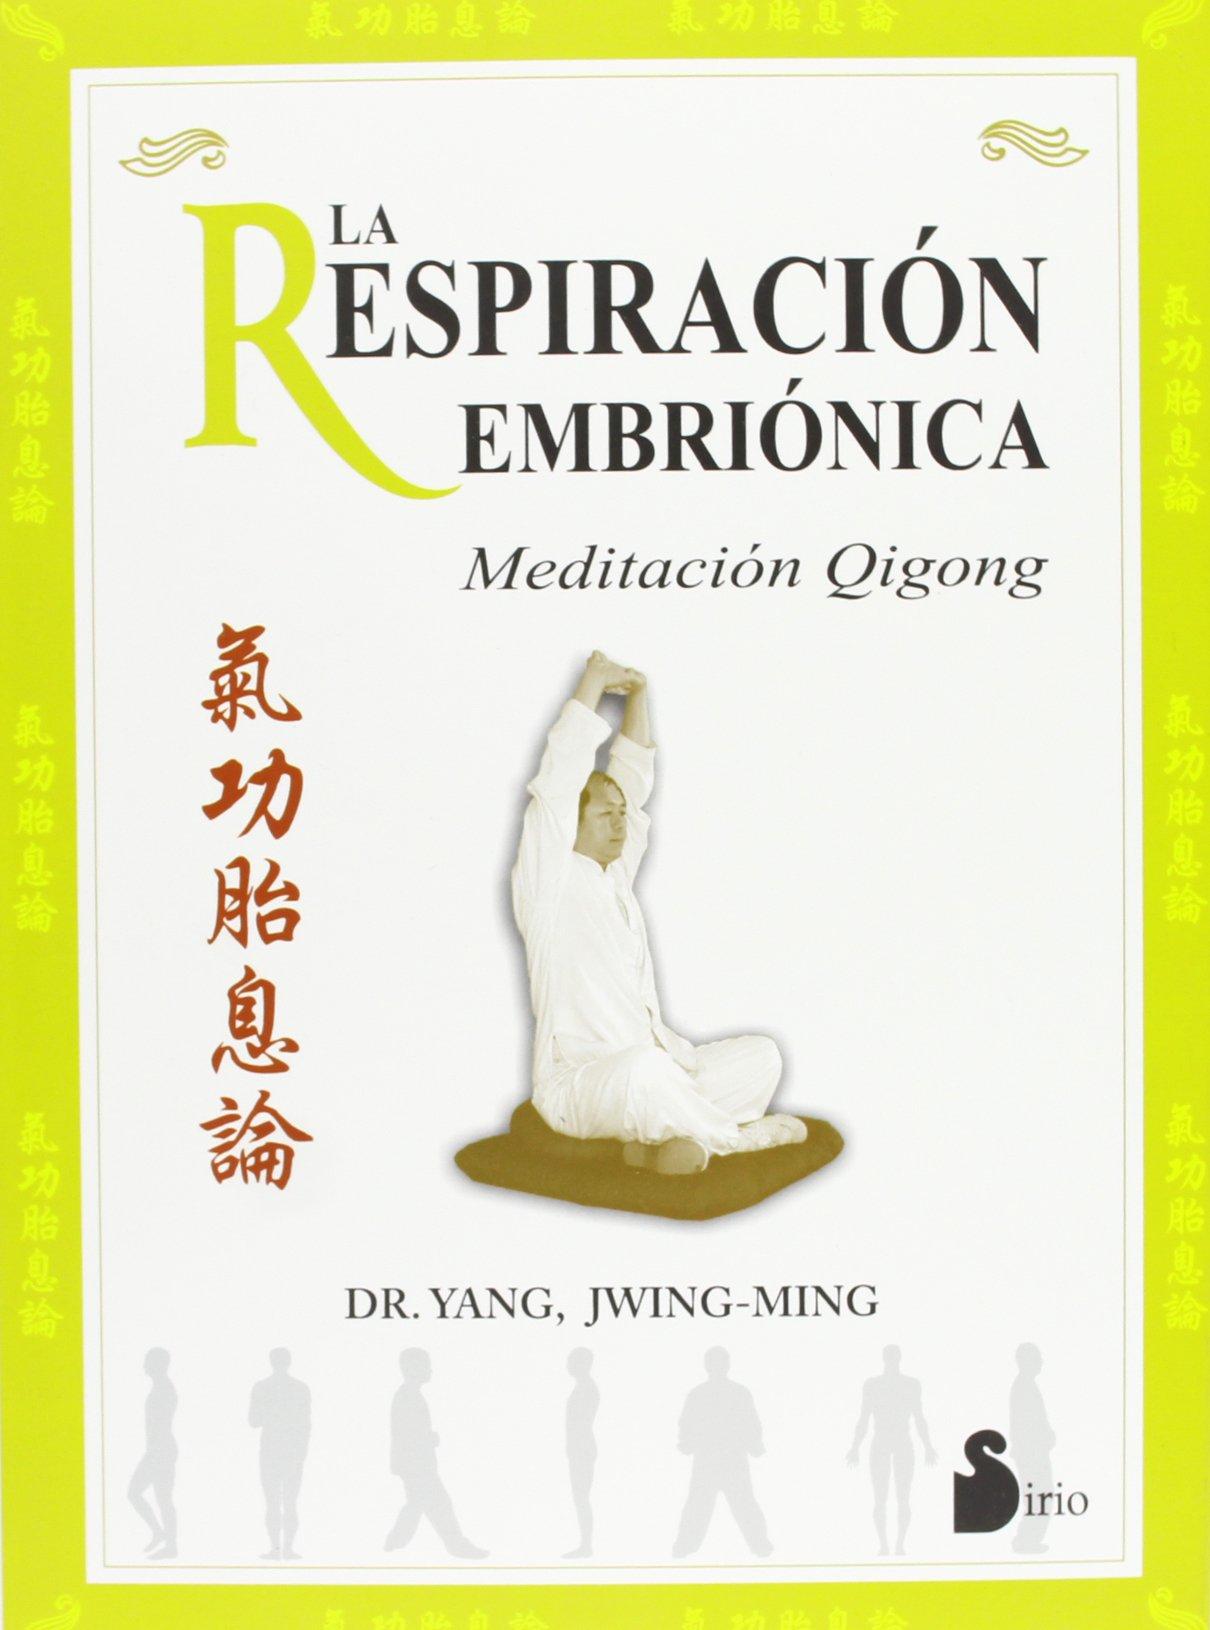 RESPIRACION EMBRIONICA, LA (2006) Tapa blanda – 2 may 2006 JWING-MING DR. YAN Editorial Sirio 8478084975 Alternative Therapies